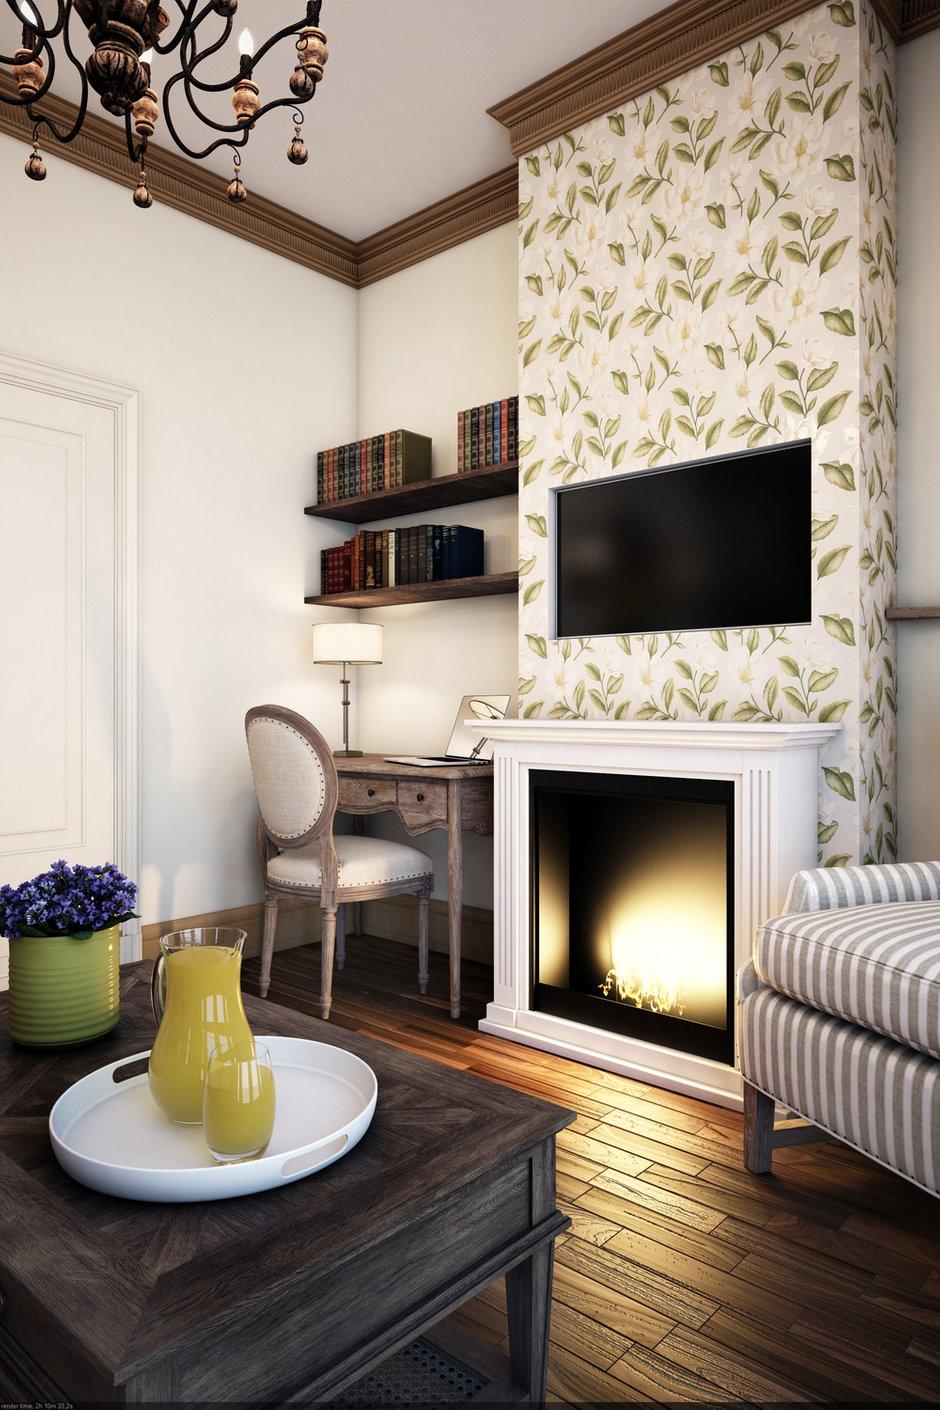 Фотография: Гостиная в стиле Прованс и Кантри, Классический, Квартира, Проект недели – фото на INMYROOM